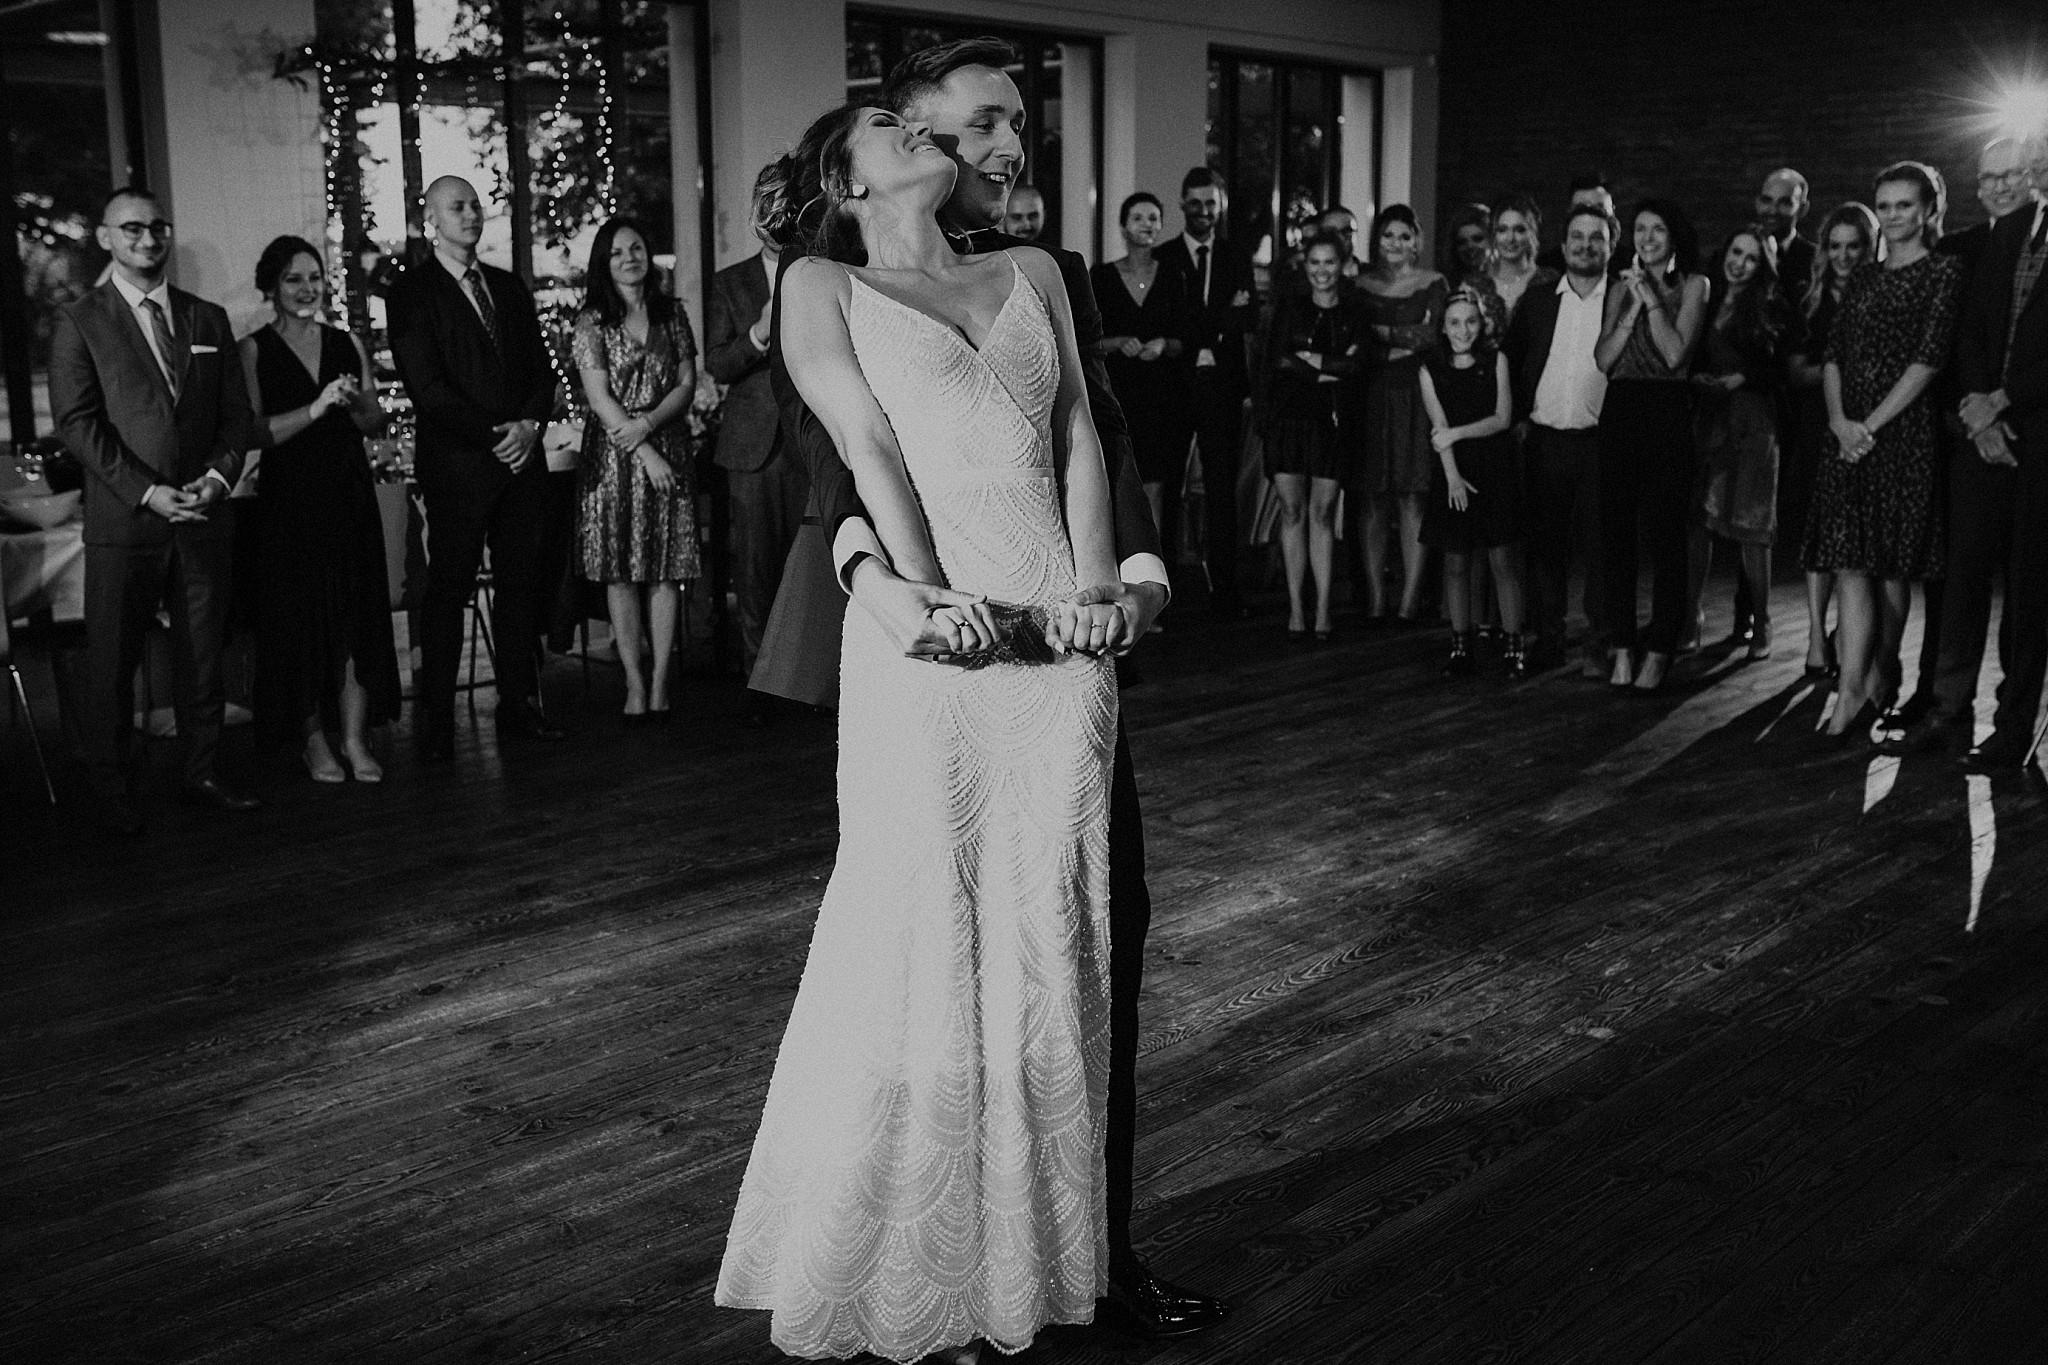 fotograf poznan wesele dobra truskawka piekne wesele pod poznaniem wesele w dobrej truskawce piekna para mloda slub marzen slub koronawirus slub listopad wesele koronawirus 310